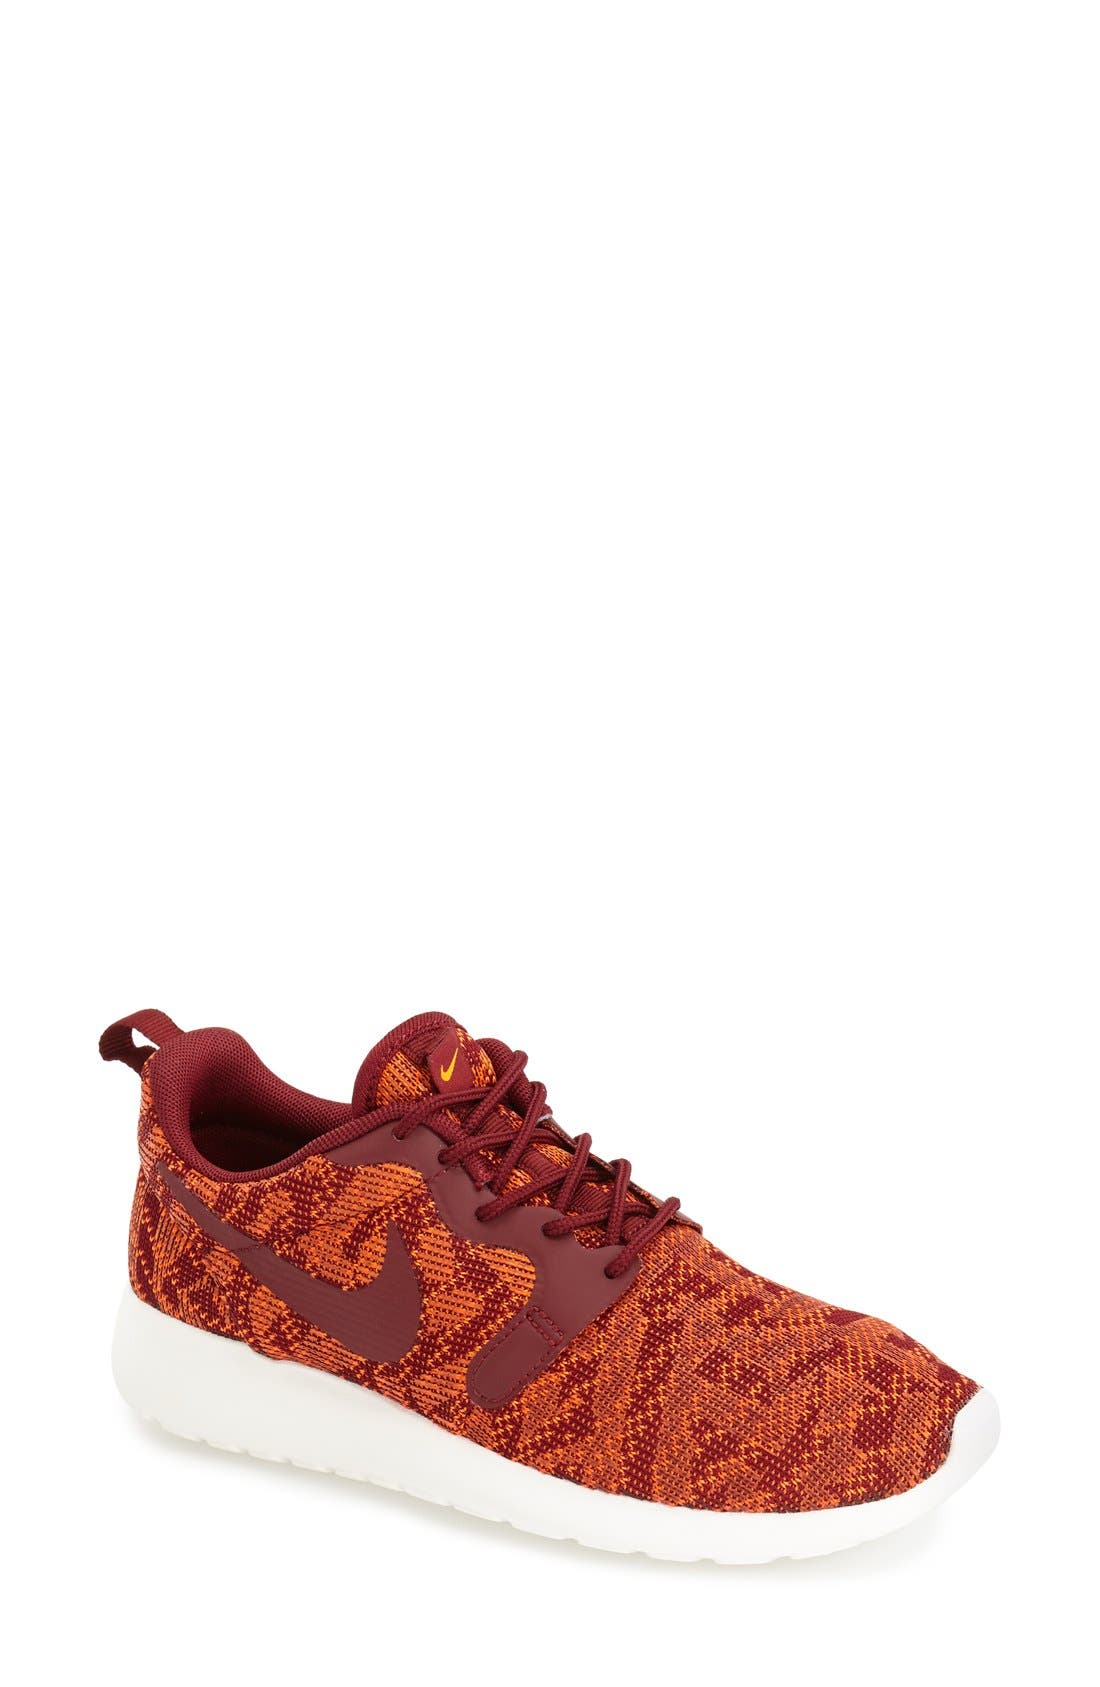 Main Image - Nike 'Roshe Run' Jacquard Sneaker (Women)